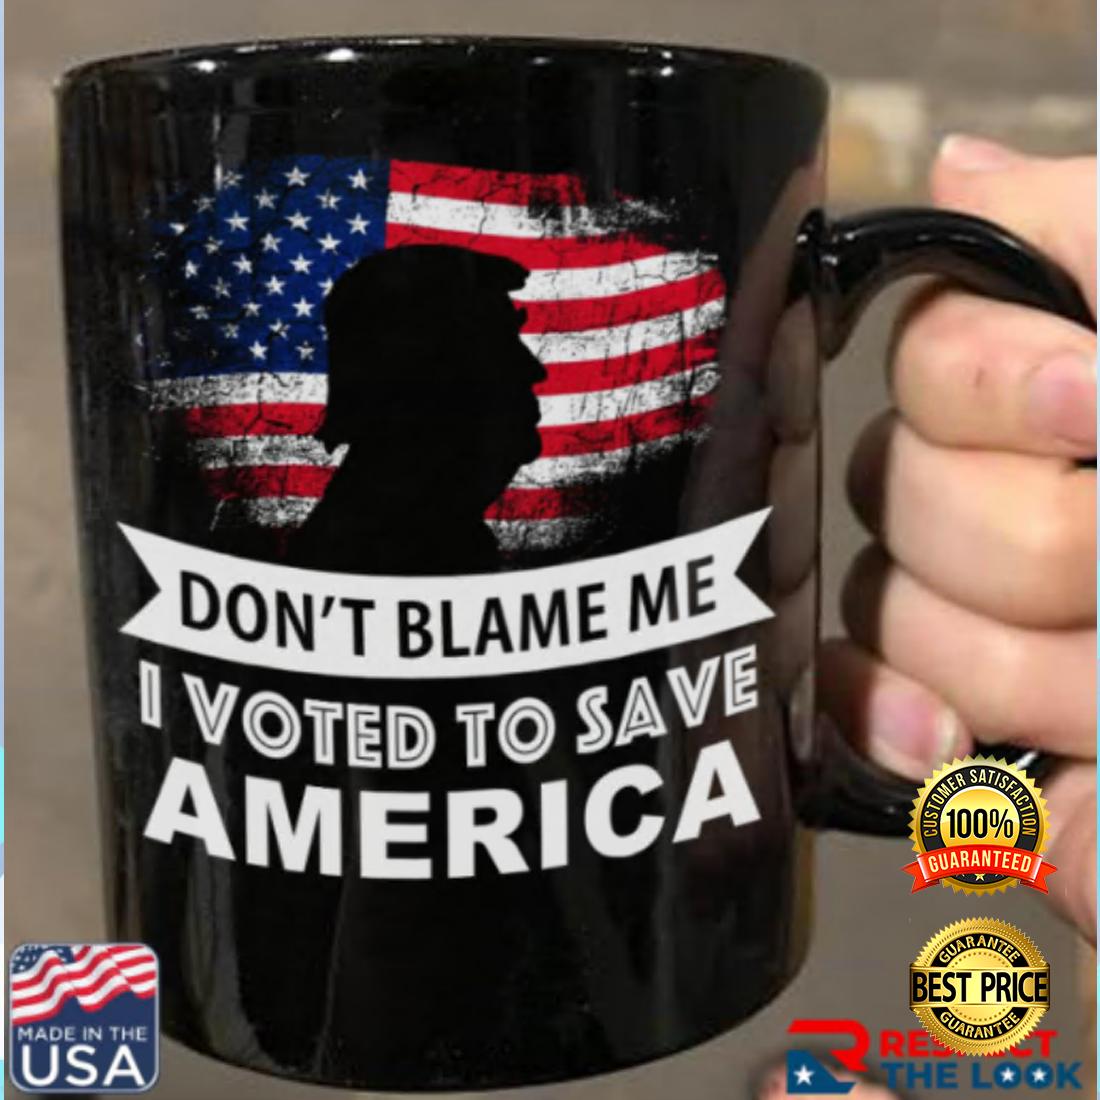 [NICE] DON'T BLAME ME I VOTE TO SAVE AMERICA MUG